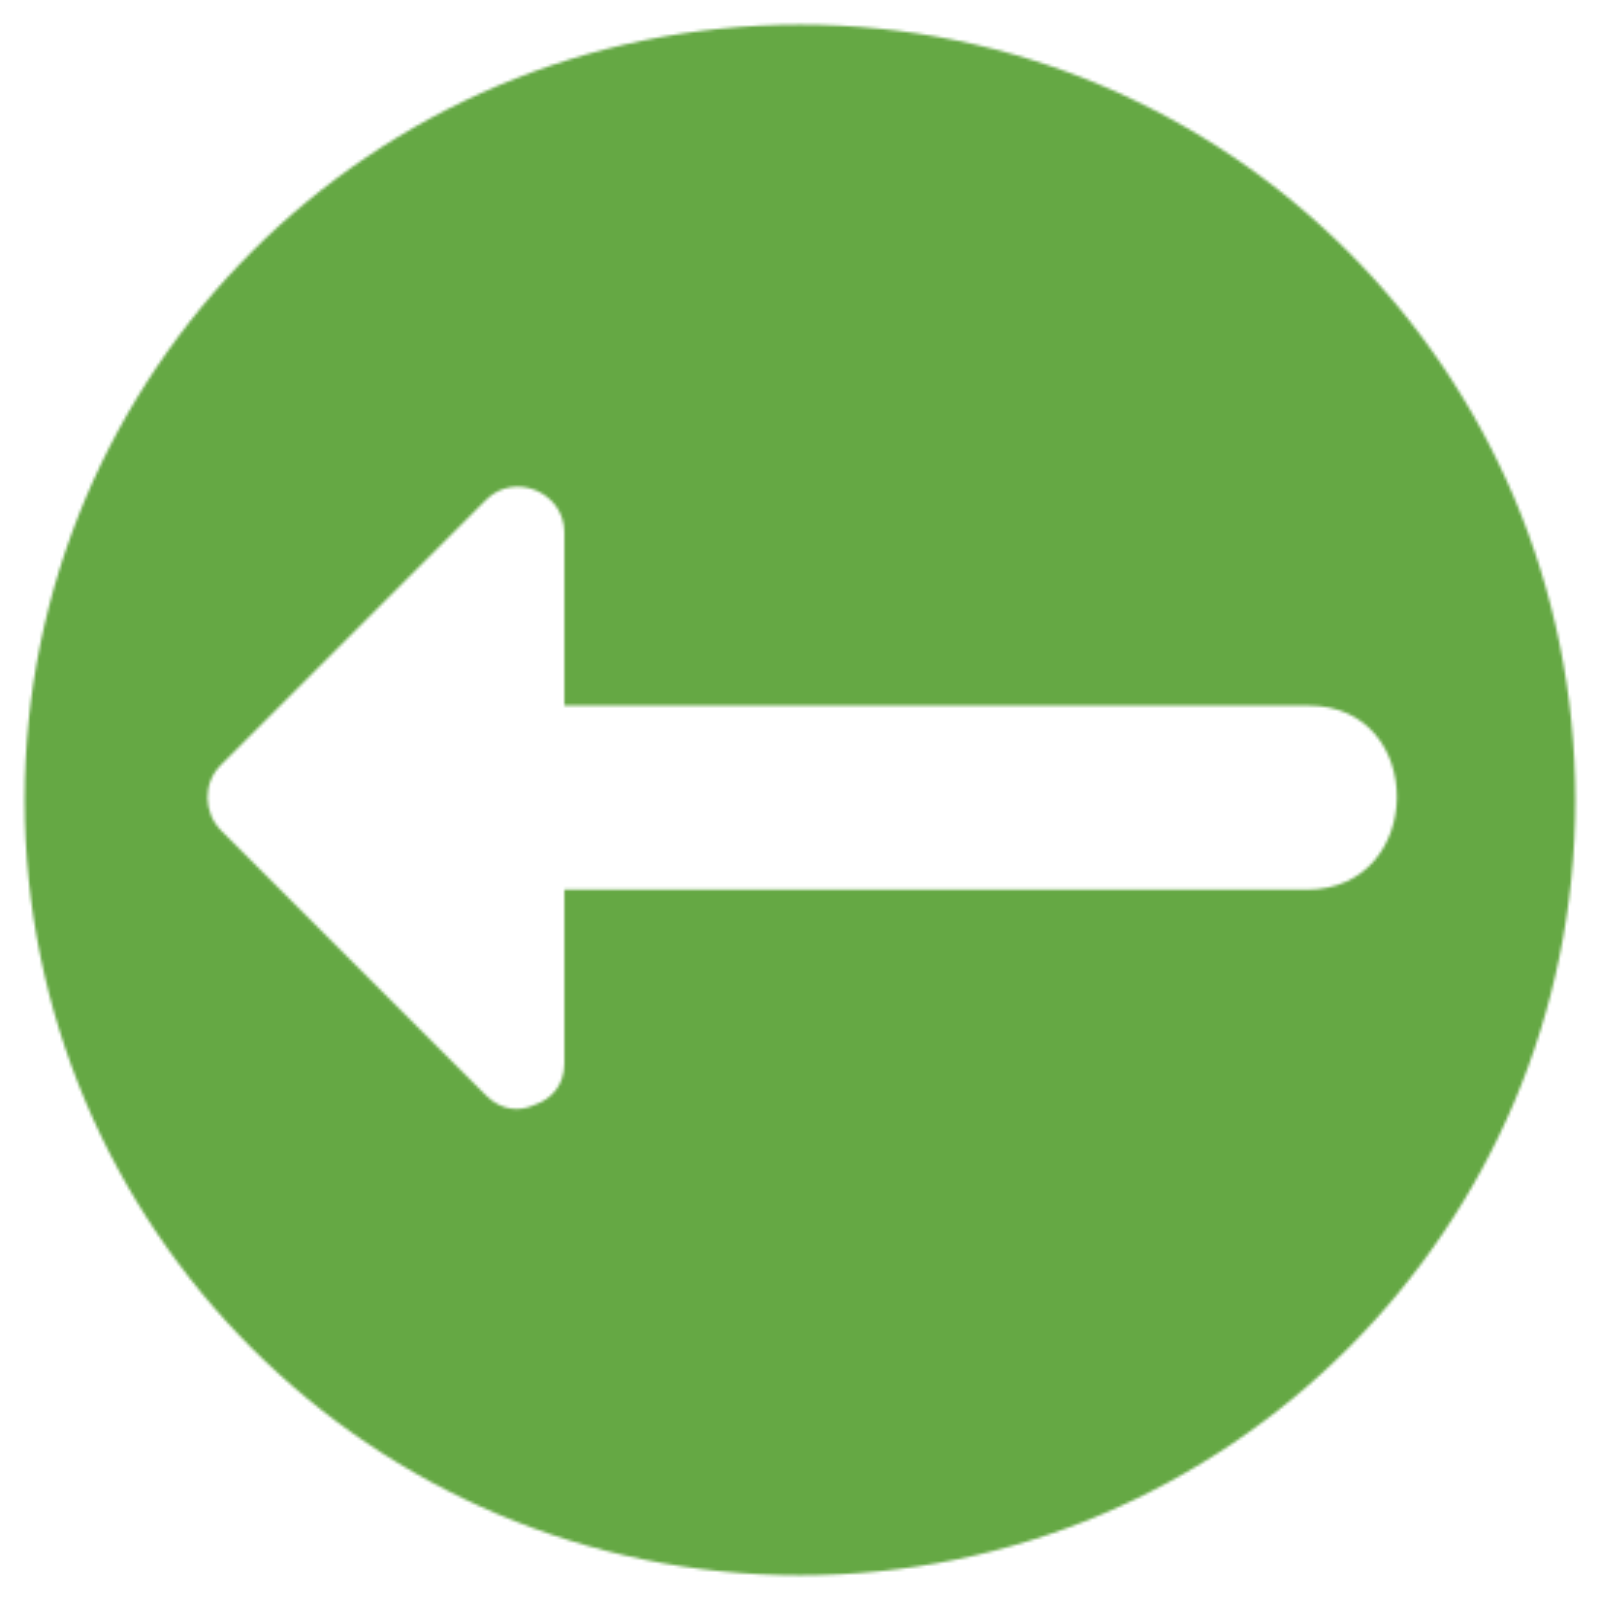 Long Arrow Left icon